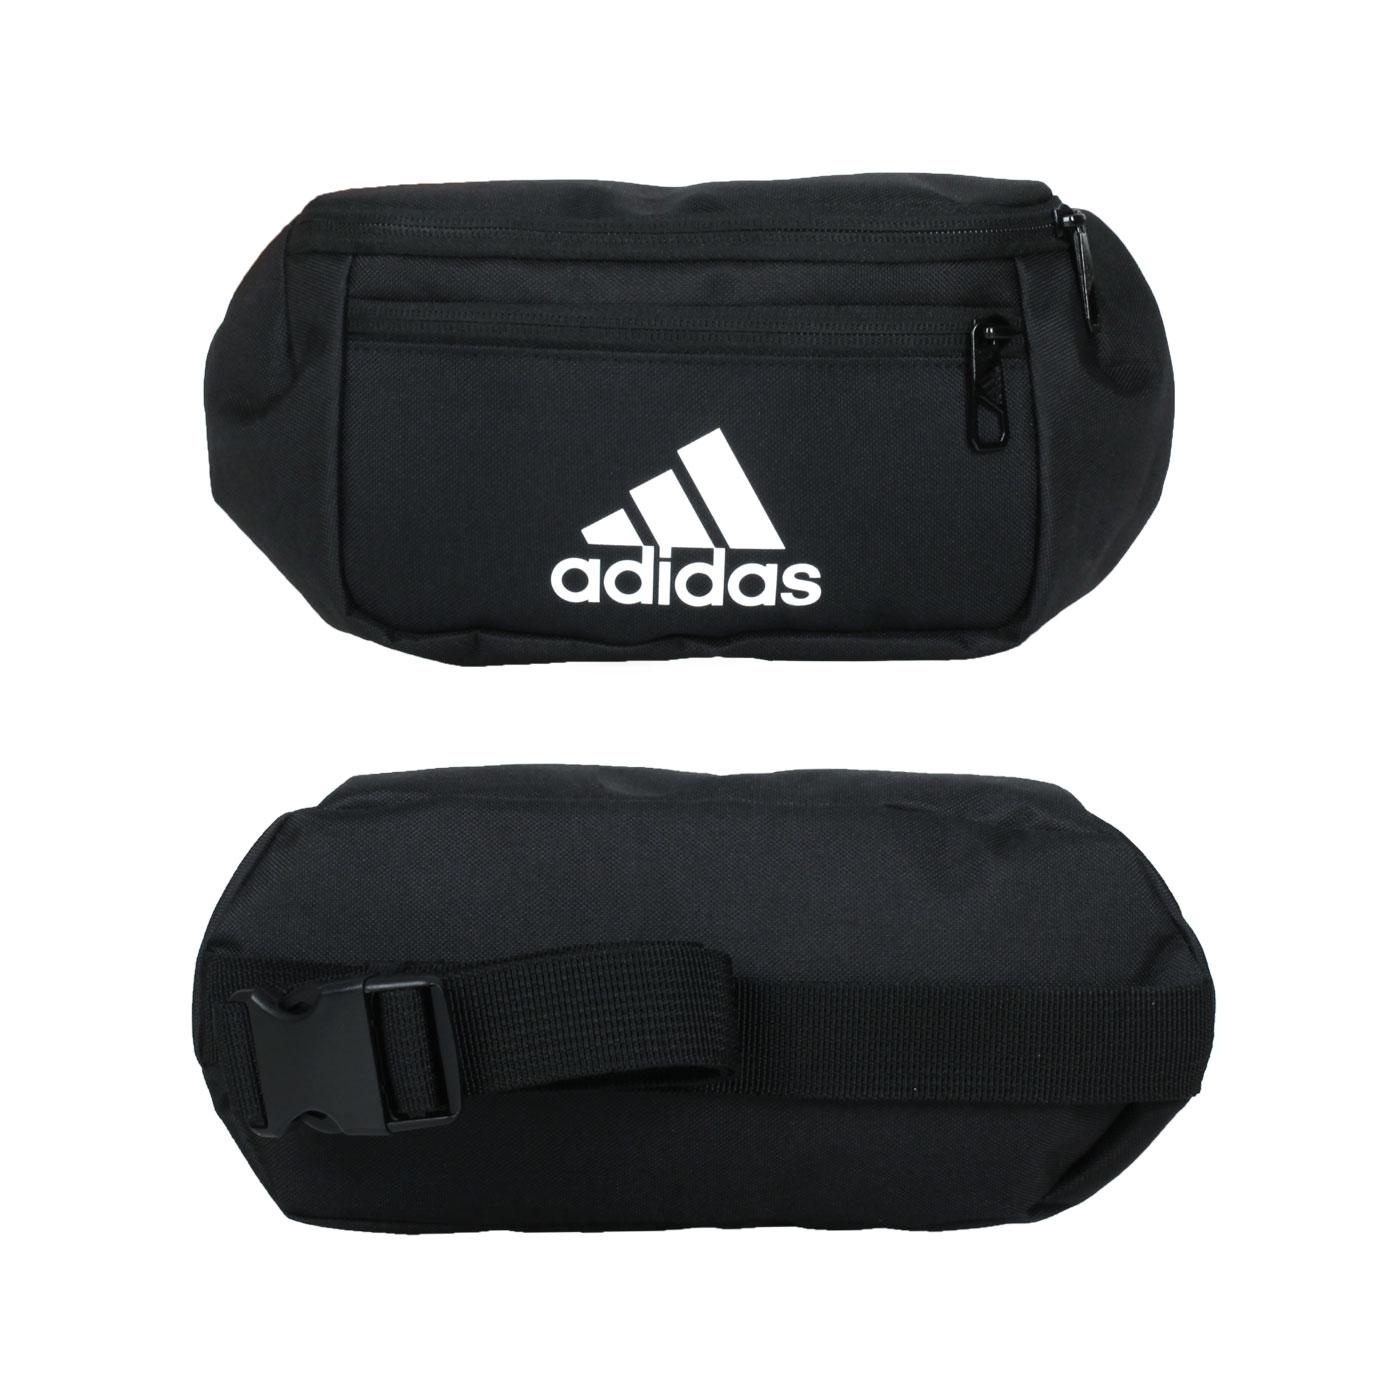 ADIDAS 小型側背包 H30343